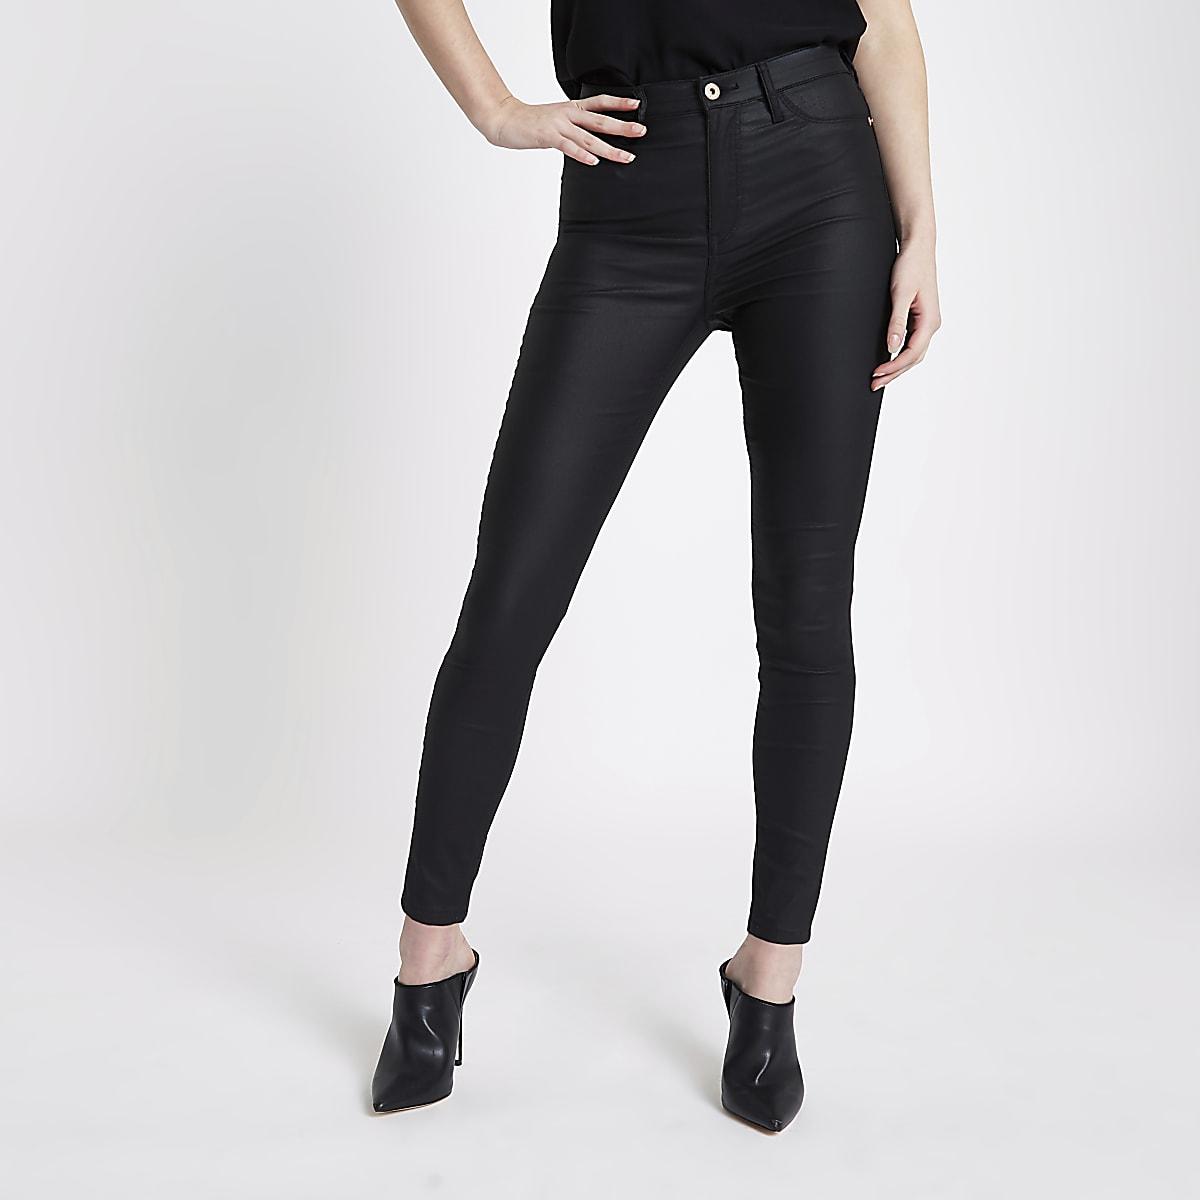 d201749fc10ac Harper – Jean taille haute noir enduit - Jeans skinny - Jeans - Femme